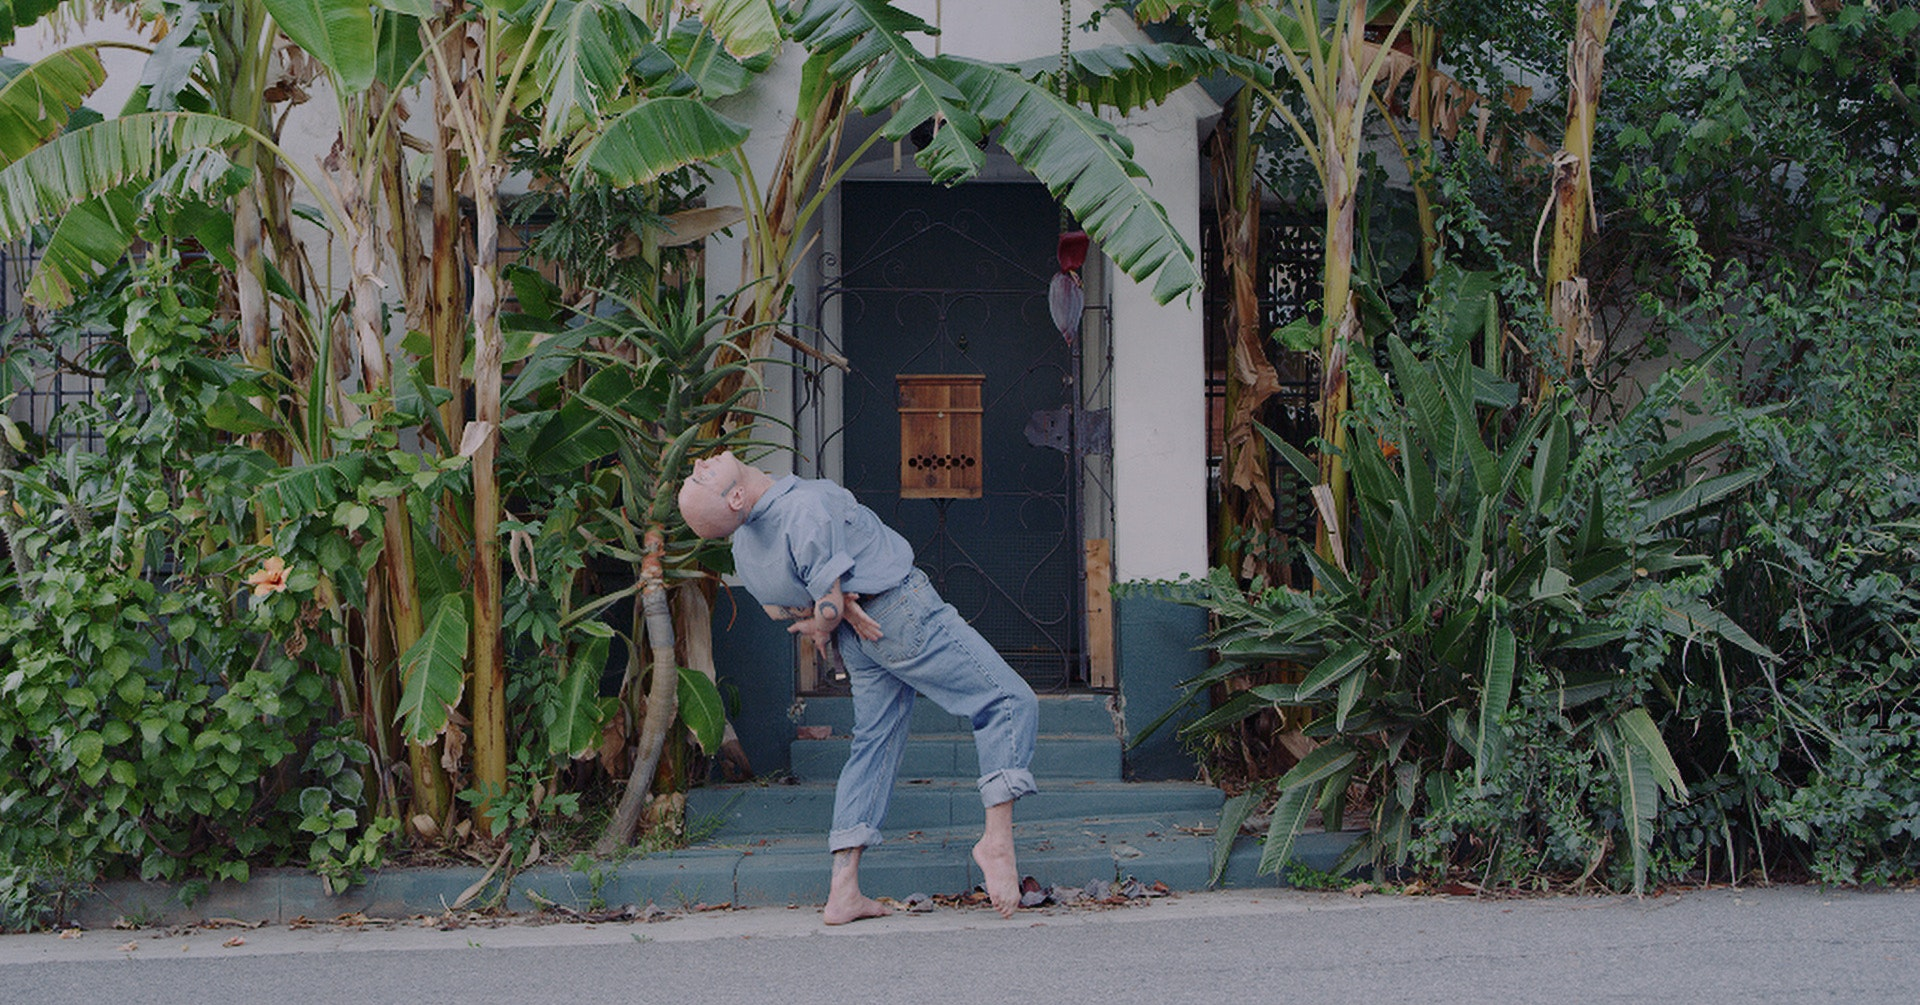 Joel Kazuo Knoernschild - 'Slow Down Time'